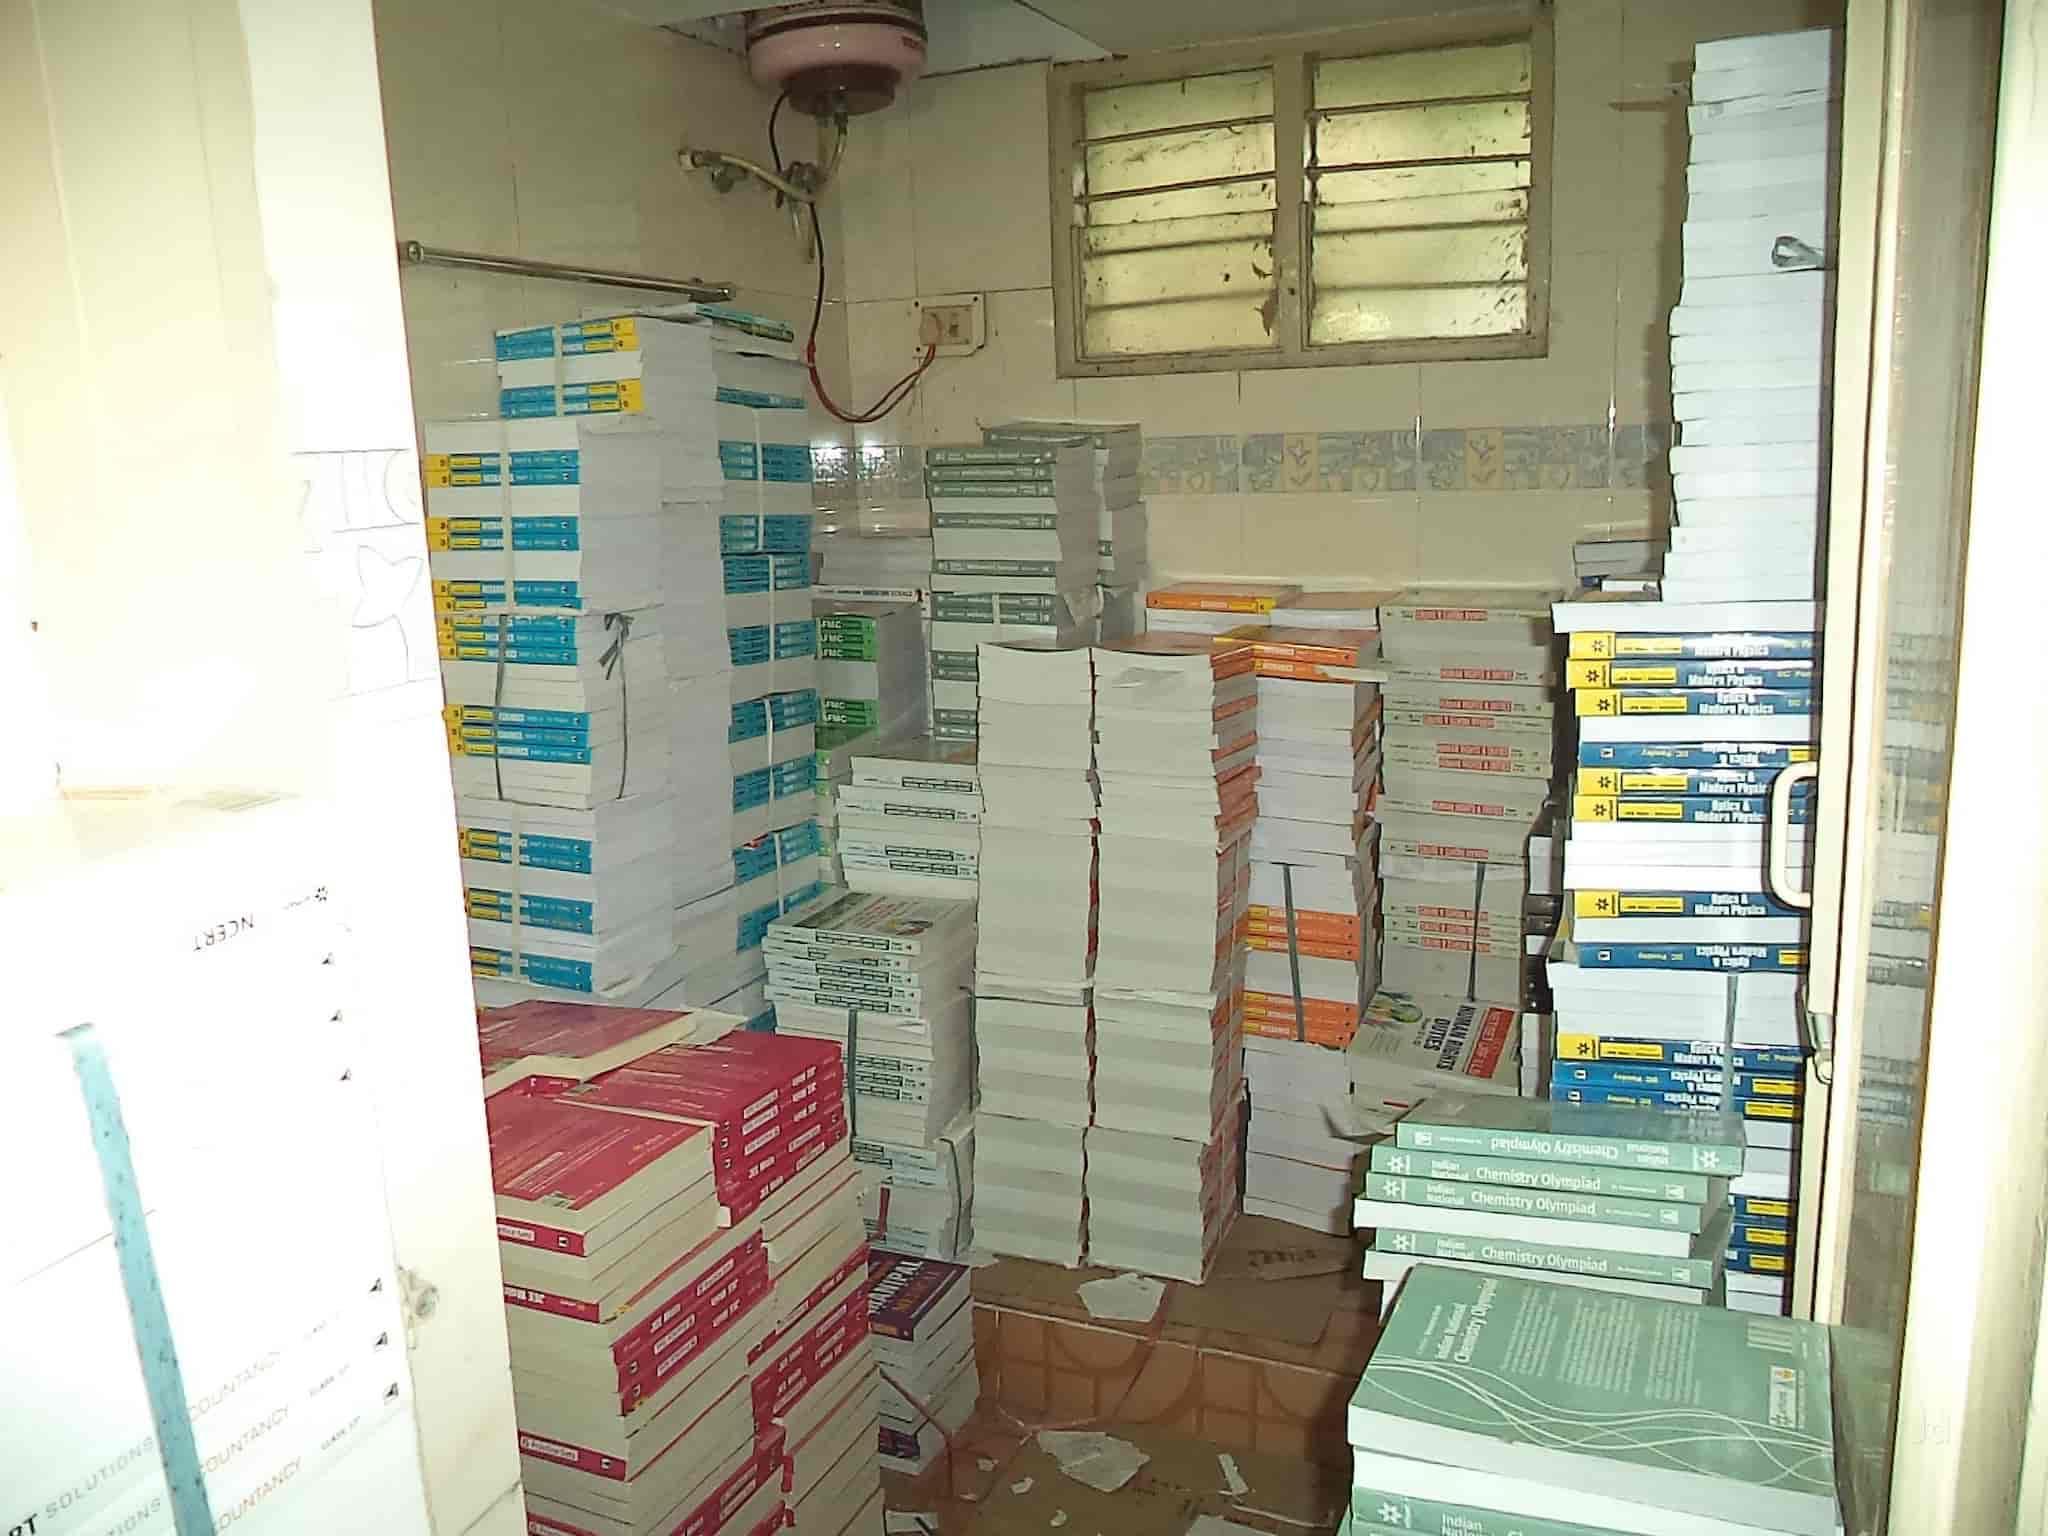 Arihant Publication India Ltd, Anna Nagar - Book Shops in